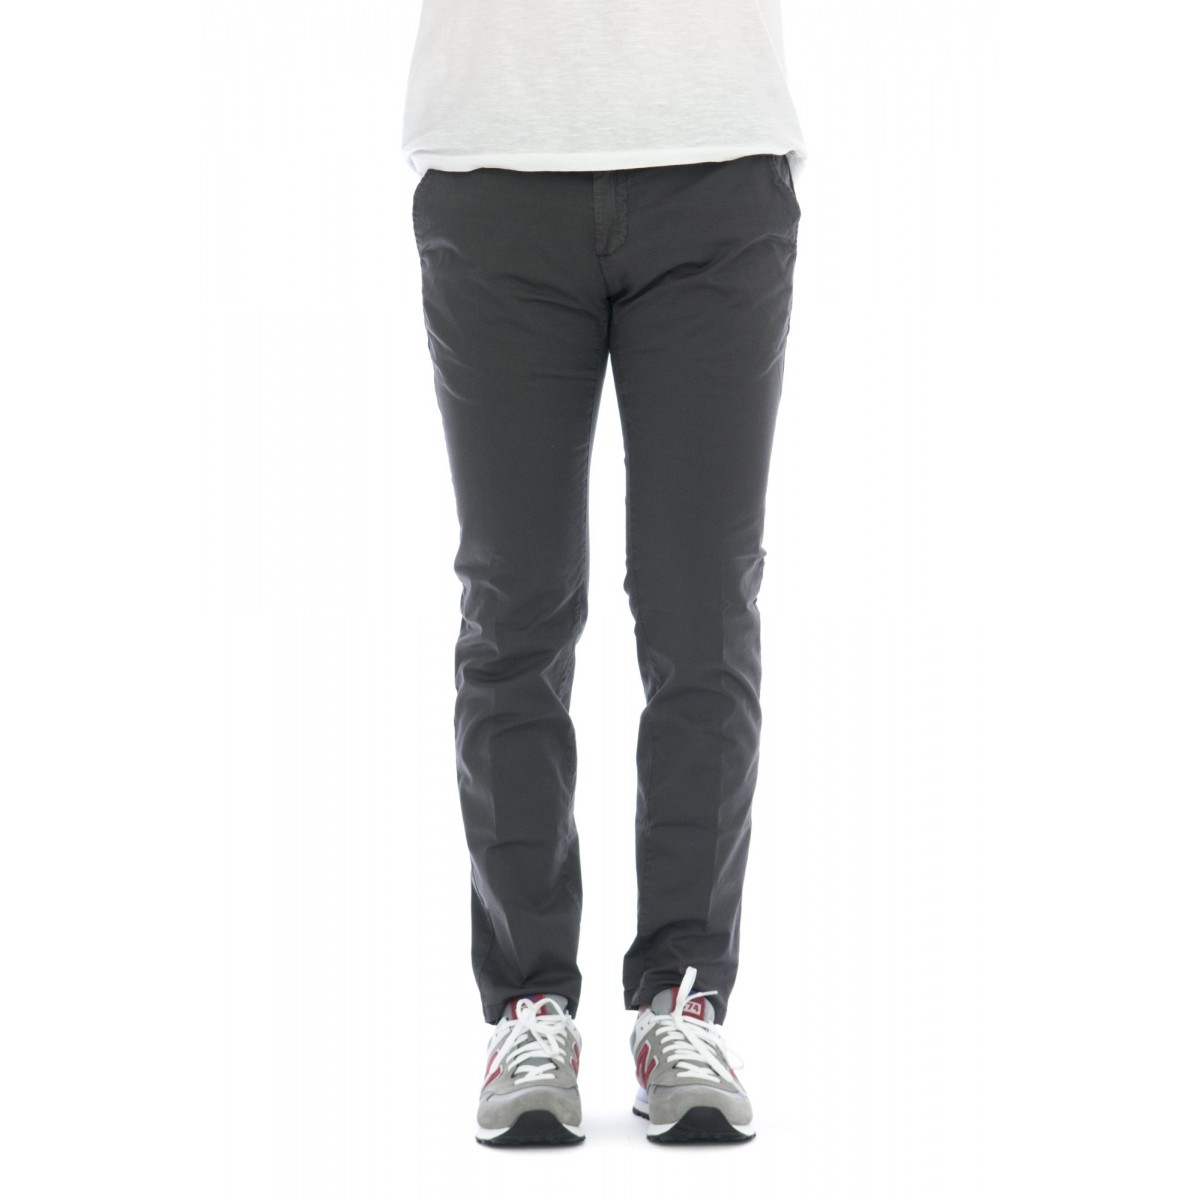 Pantalone uomo - M08l pantalone slim cotone raso